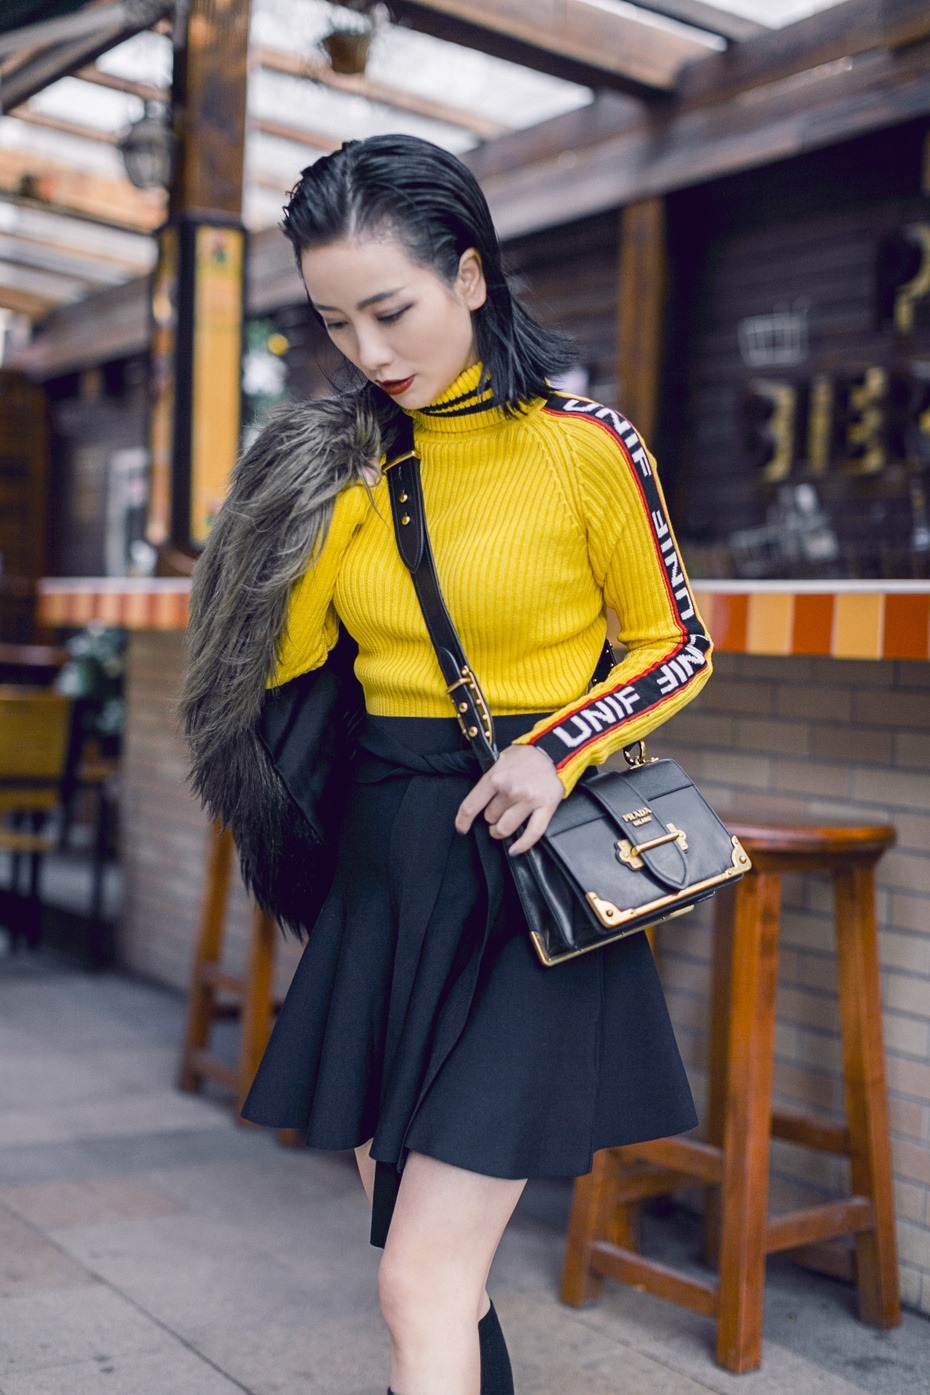 【妮儿の私服日记】 就是要帅着过新年~ - Nikki妮儿 - Nikkis Fashion Blog